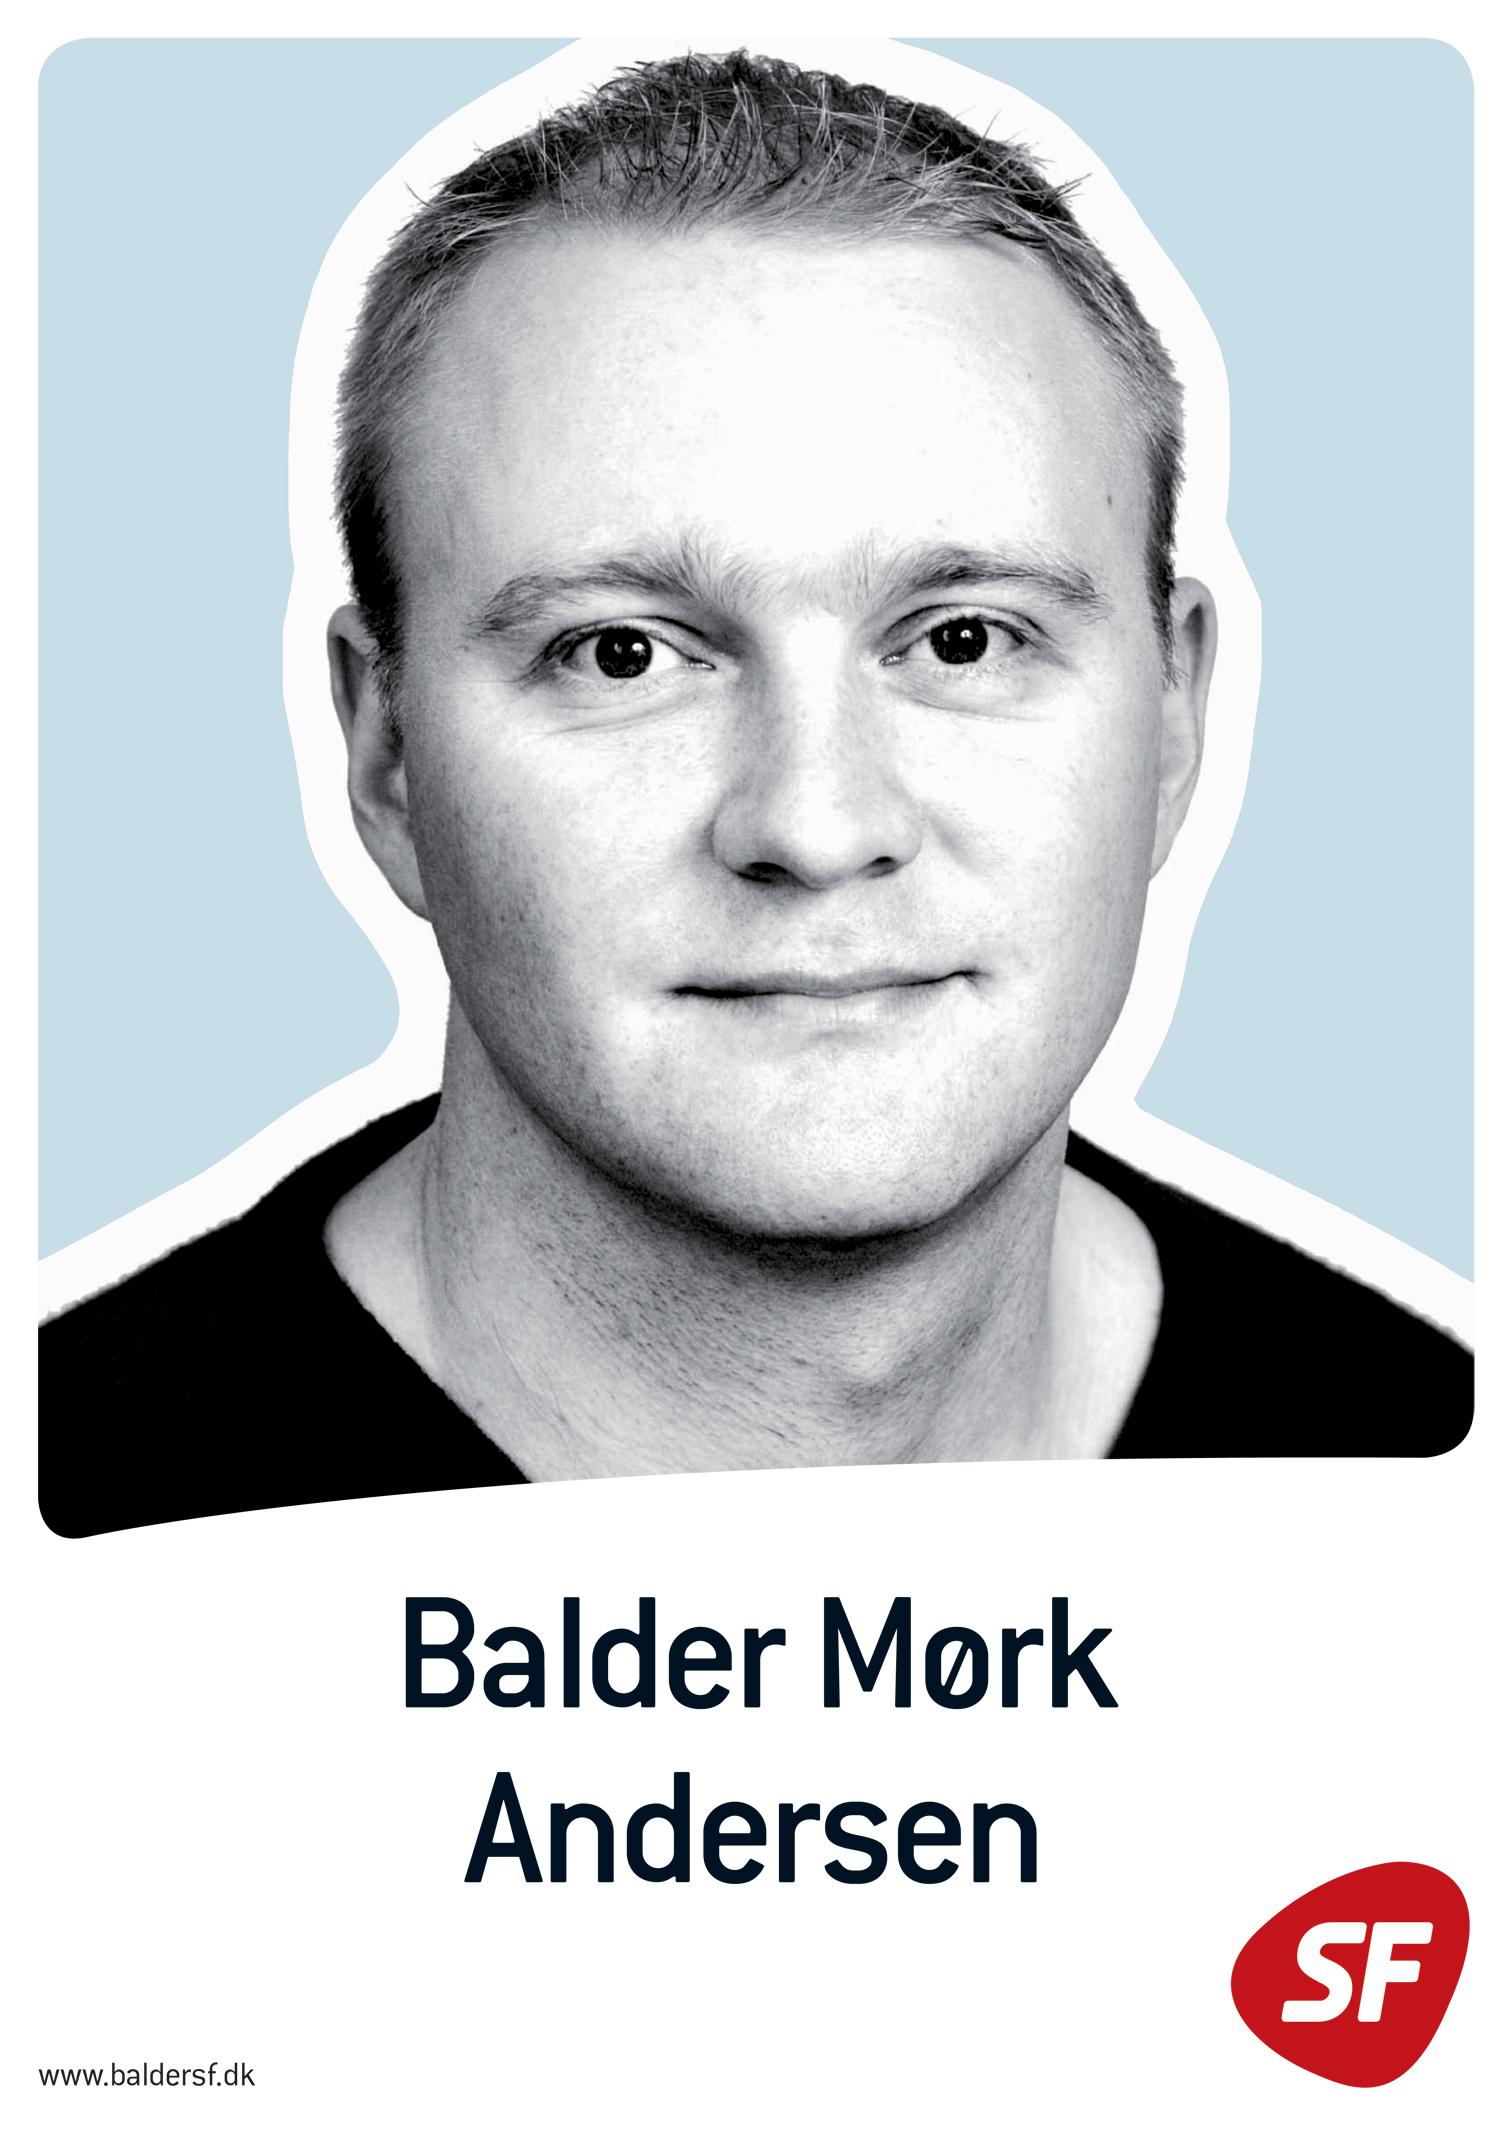 Balder Mørk Andersens plakat